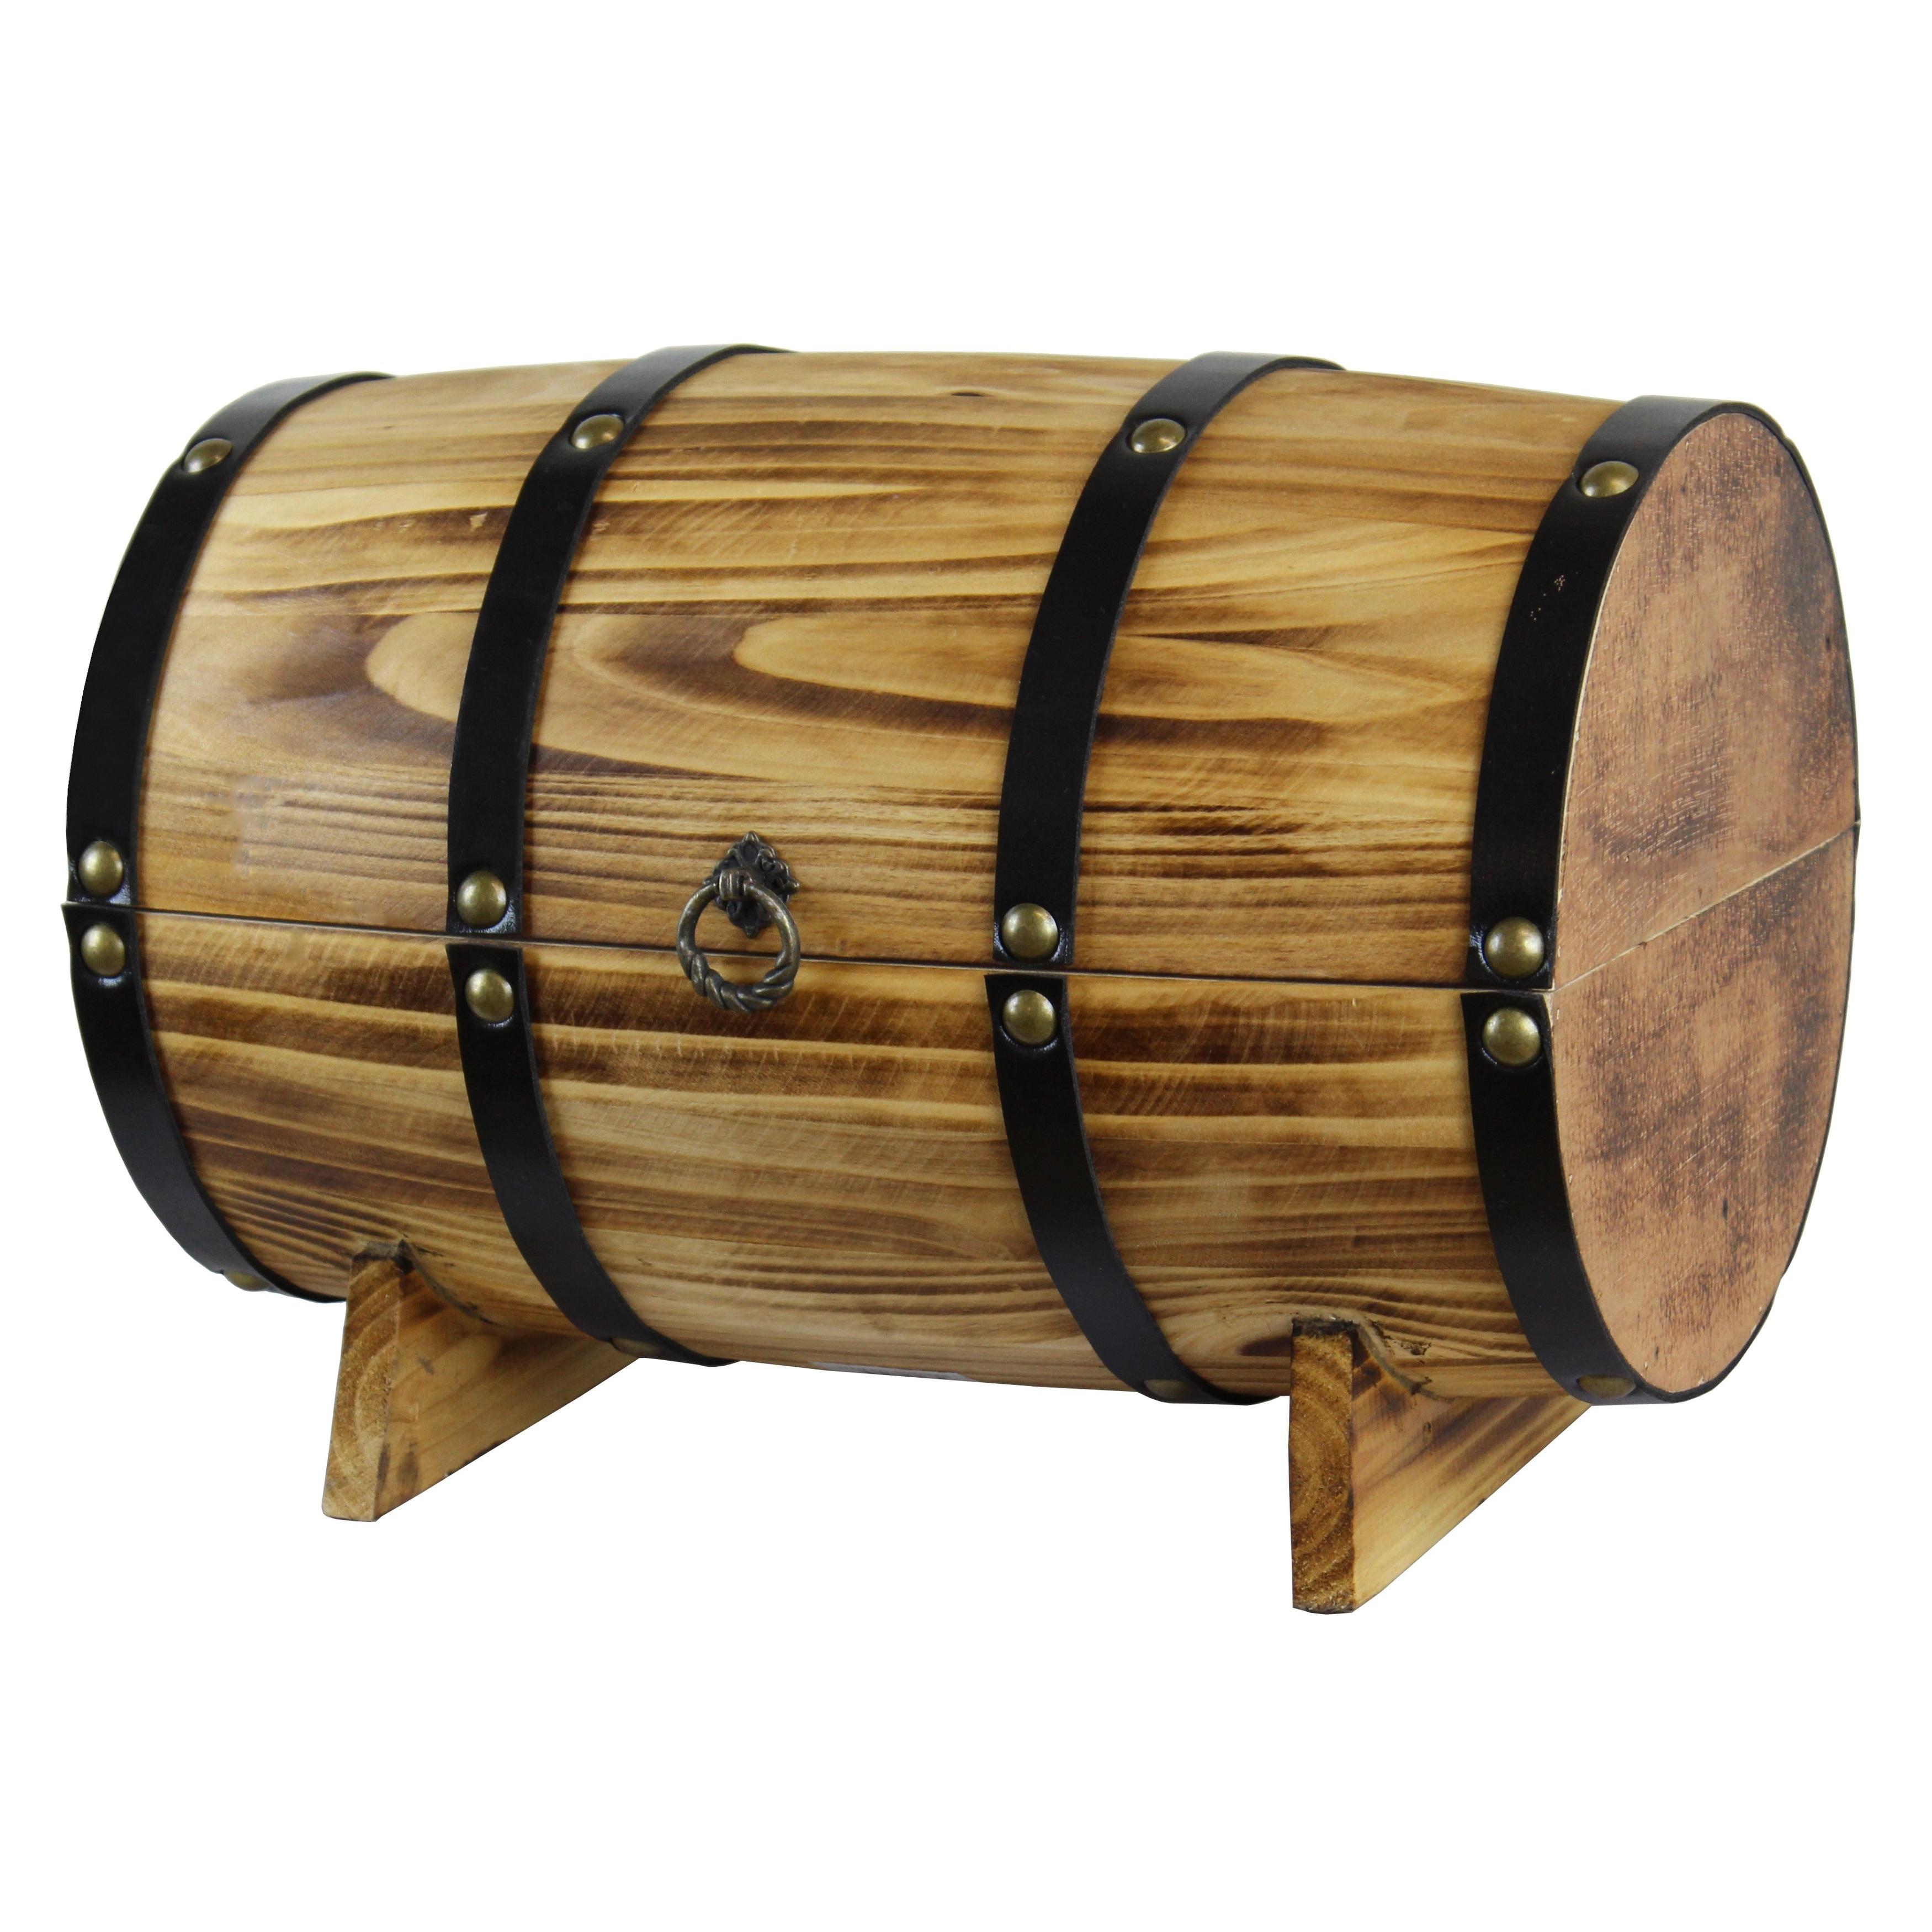 Vintiquewise Wooden Barrel Treasure Chest, Red wine